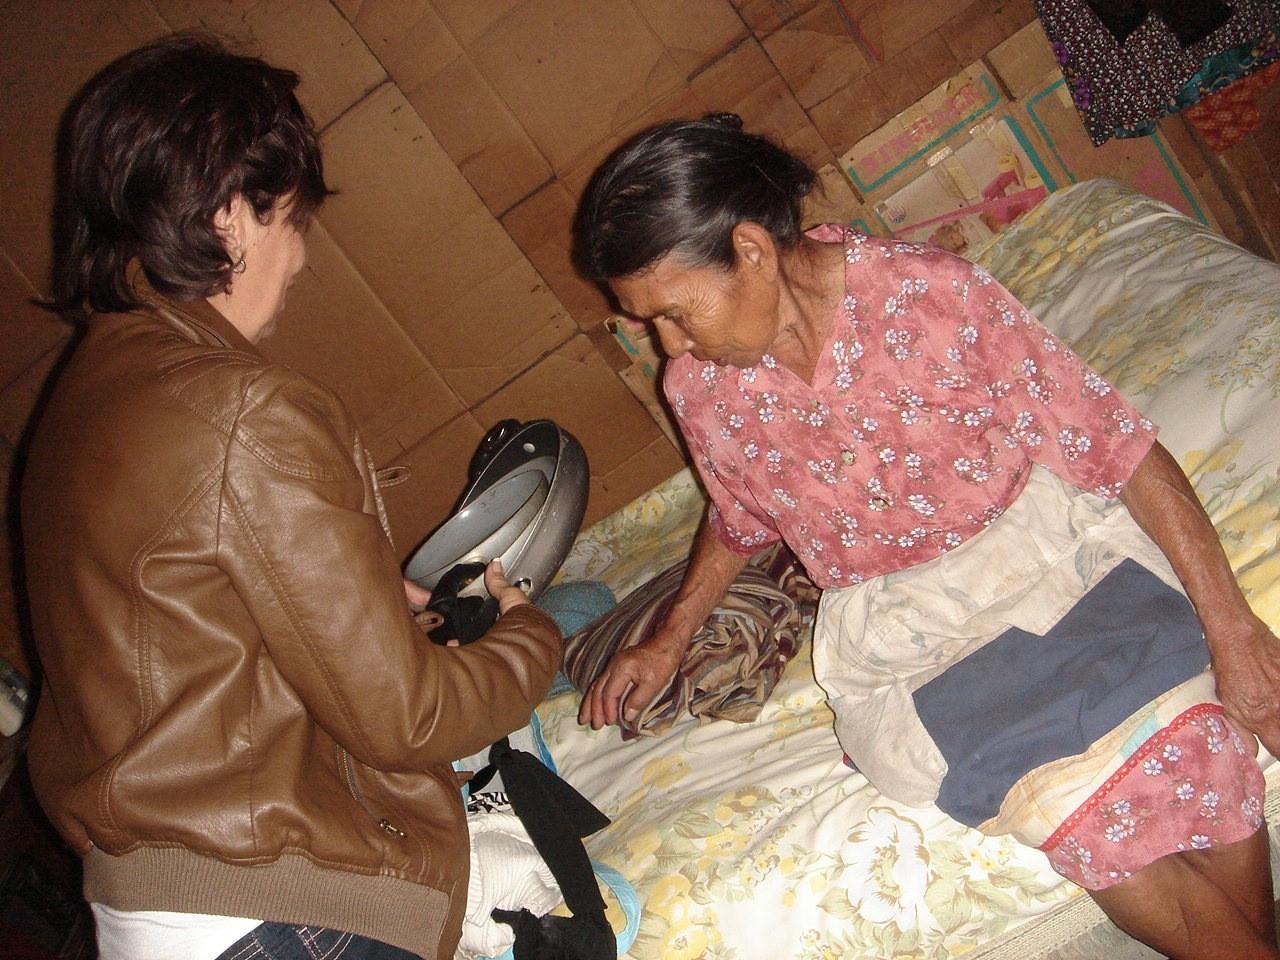 Bringing Donations